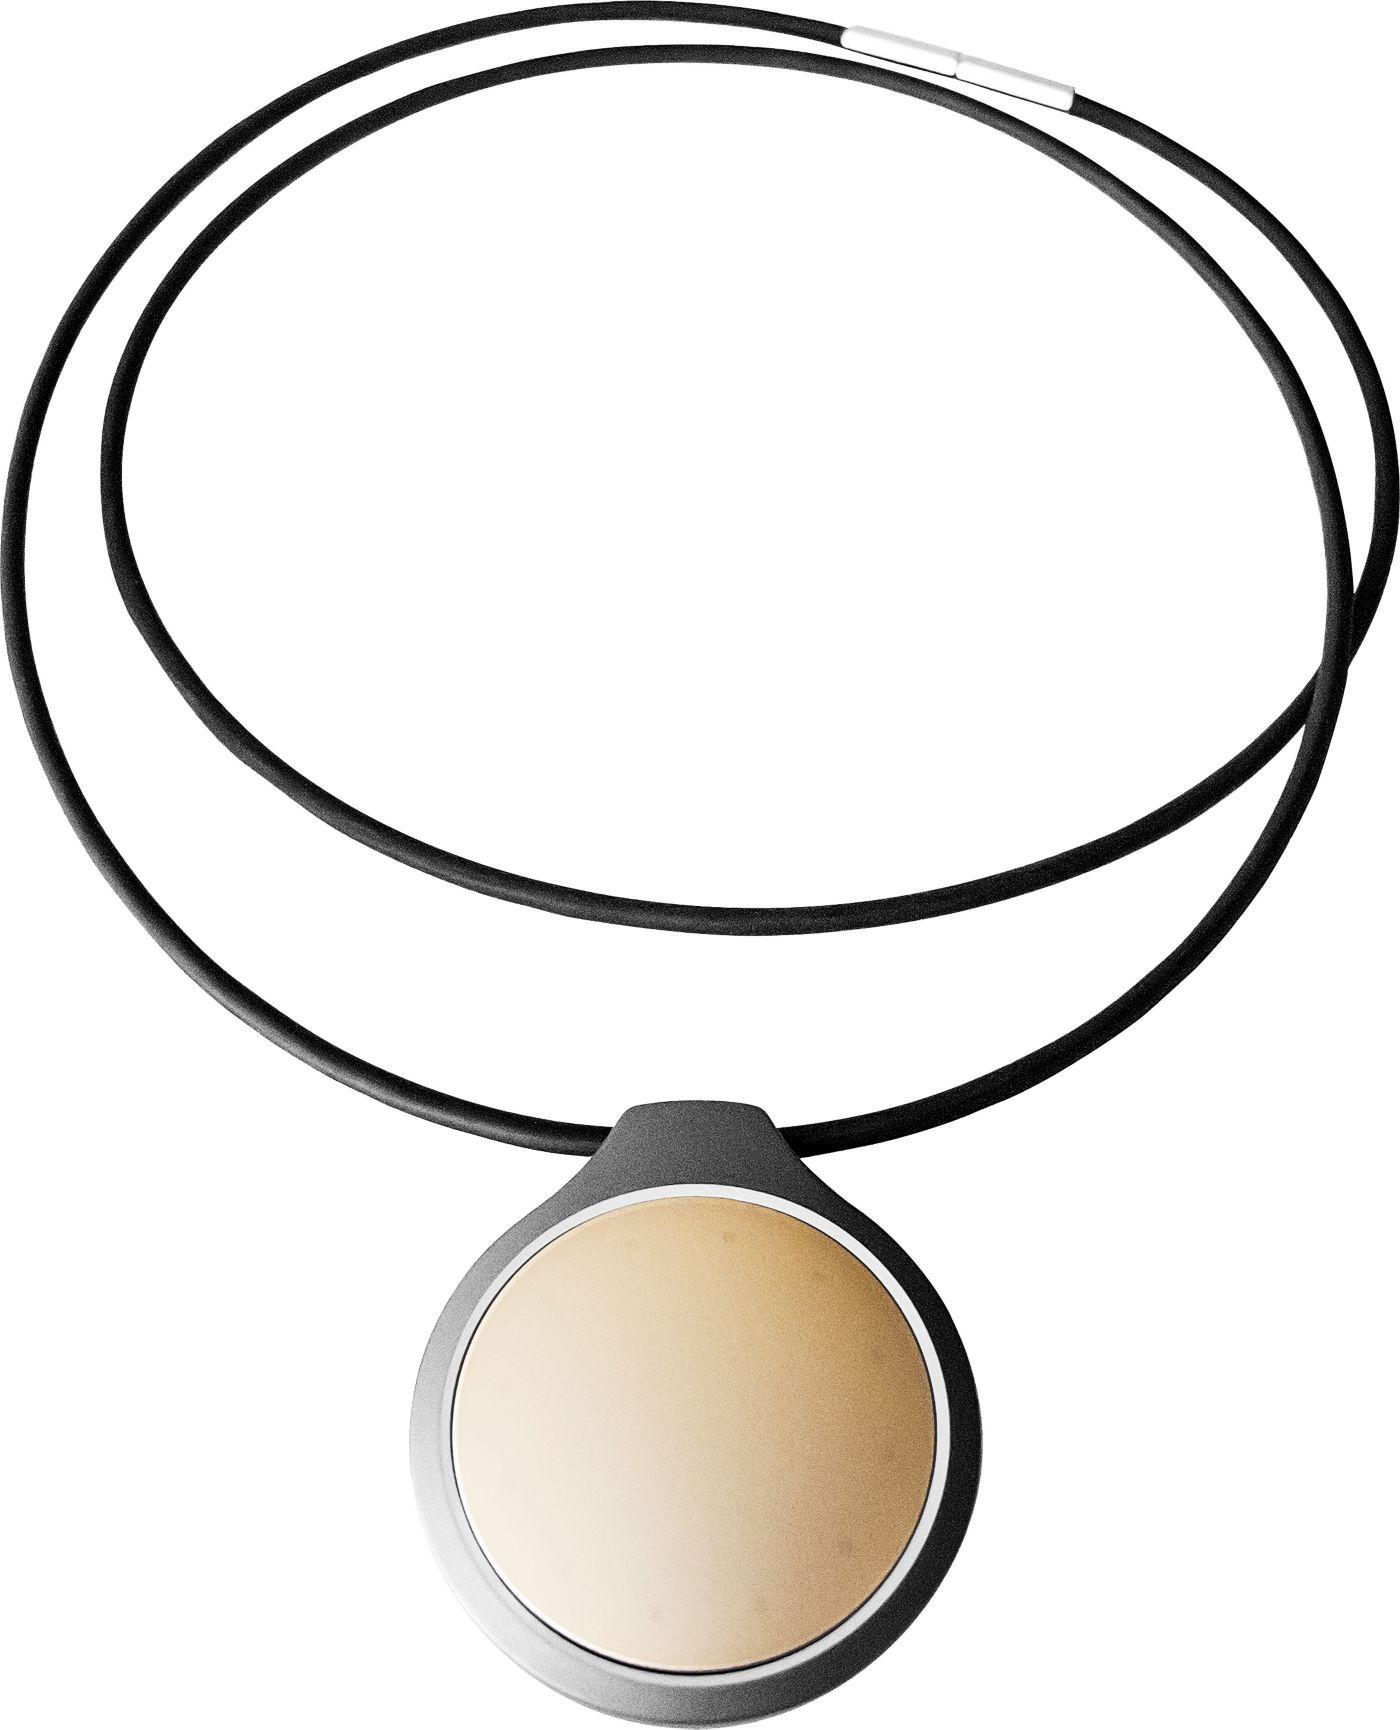 Misfit Sport Necklace for Shine